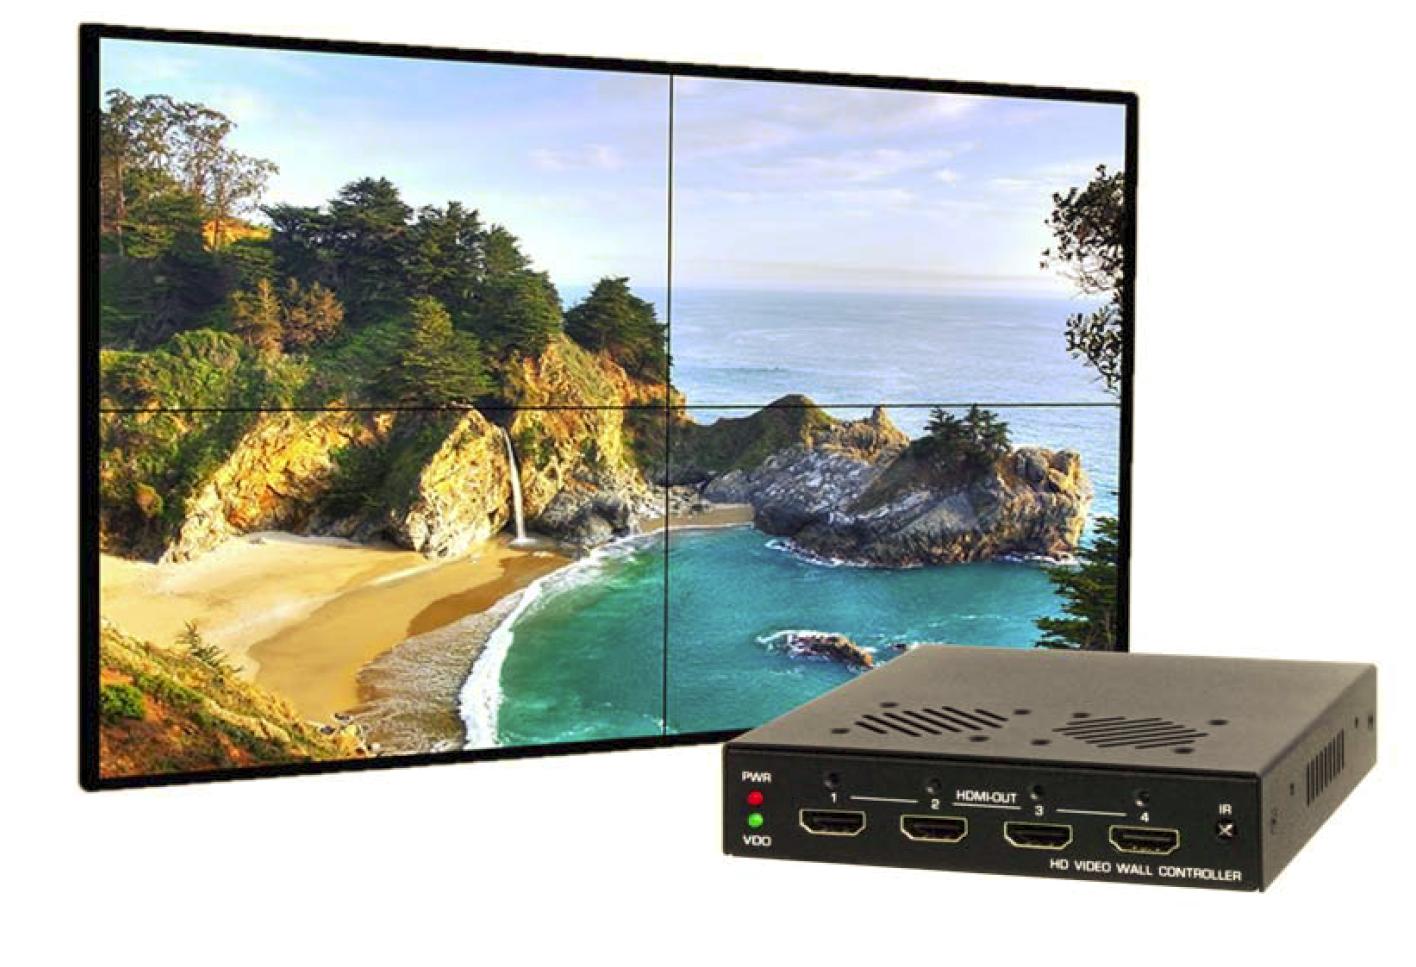 HDMI or VGA to 2x2 or 1x4 HDMI 4-Monitor Video Wall